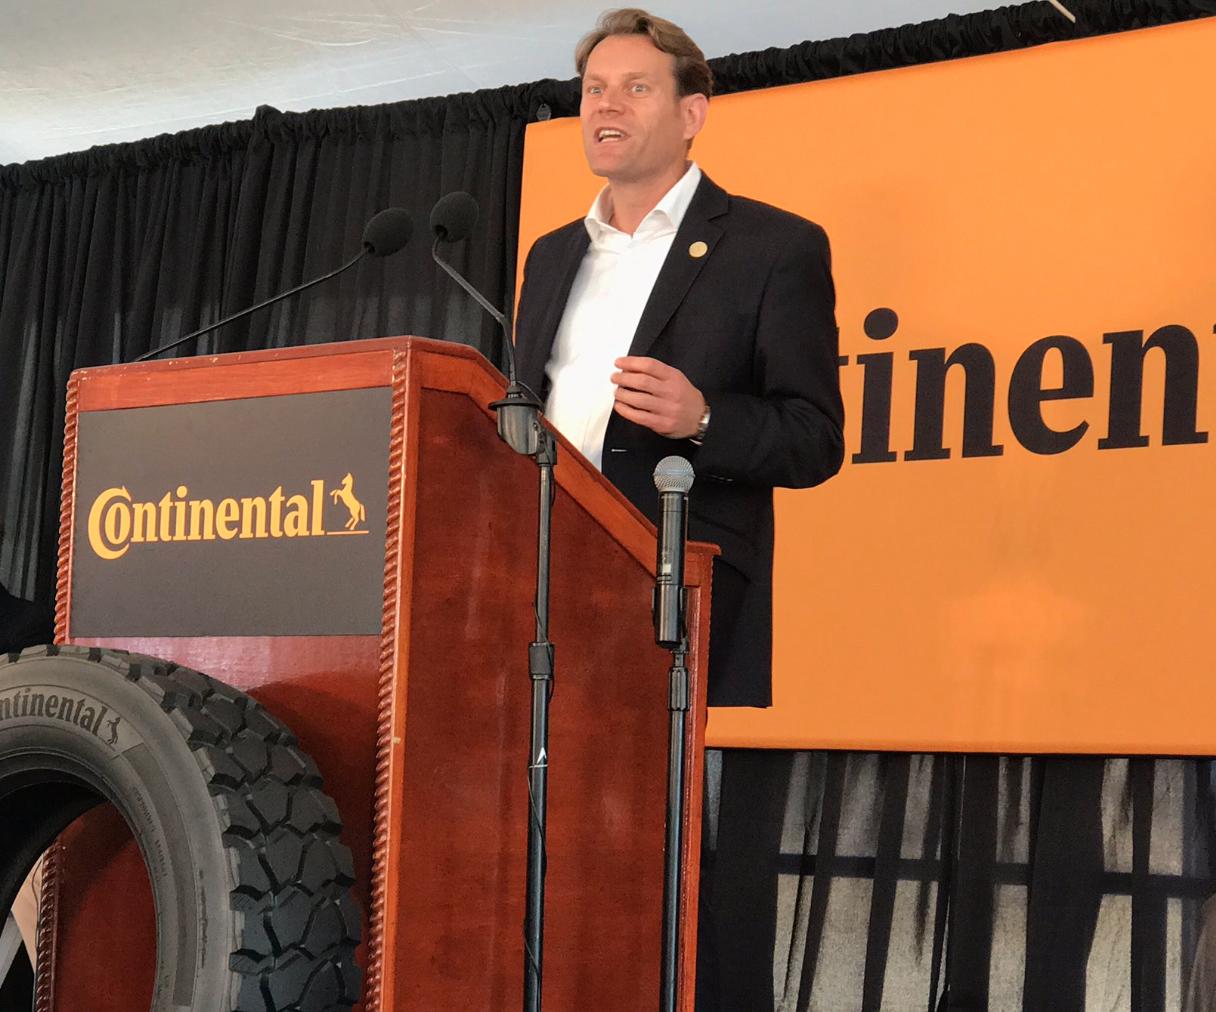 Continental Tire Breaks Ground On 1 4 Billion Truck Tire Plant In